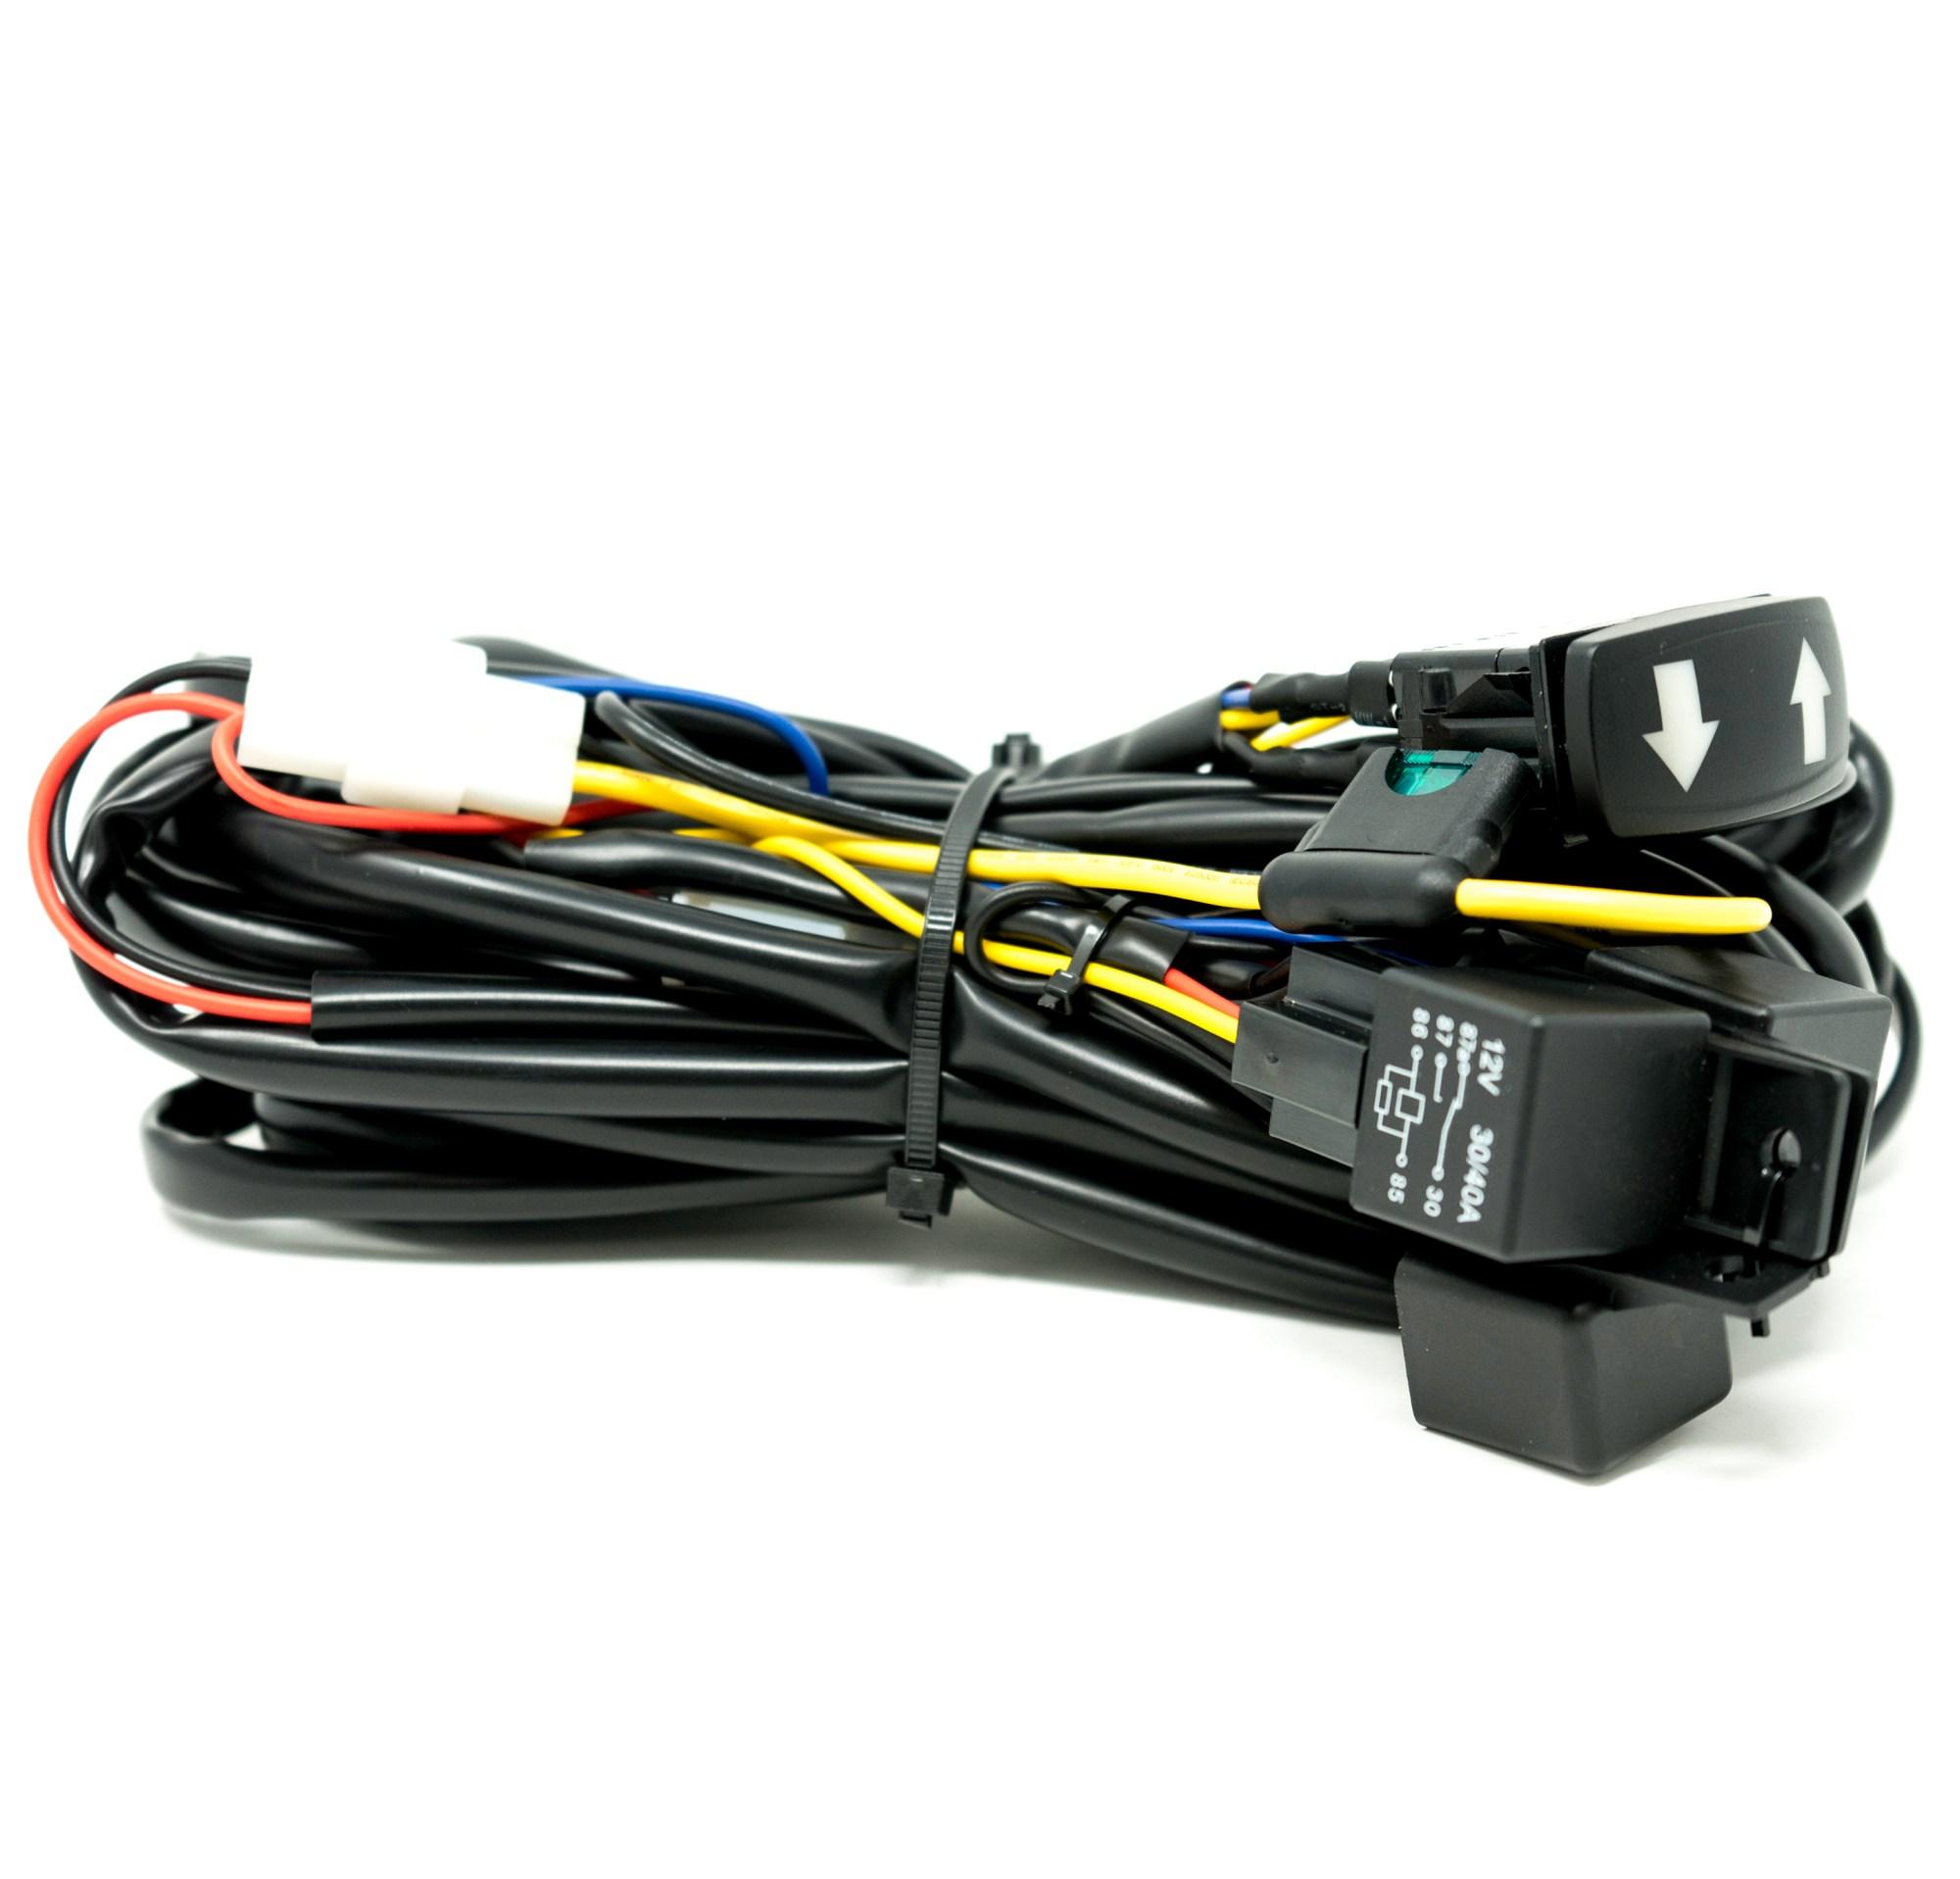 hight resolution of home vehicle specific lighting polaris baja designs rtl s turn signal wiring harness for utvs